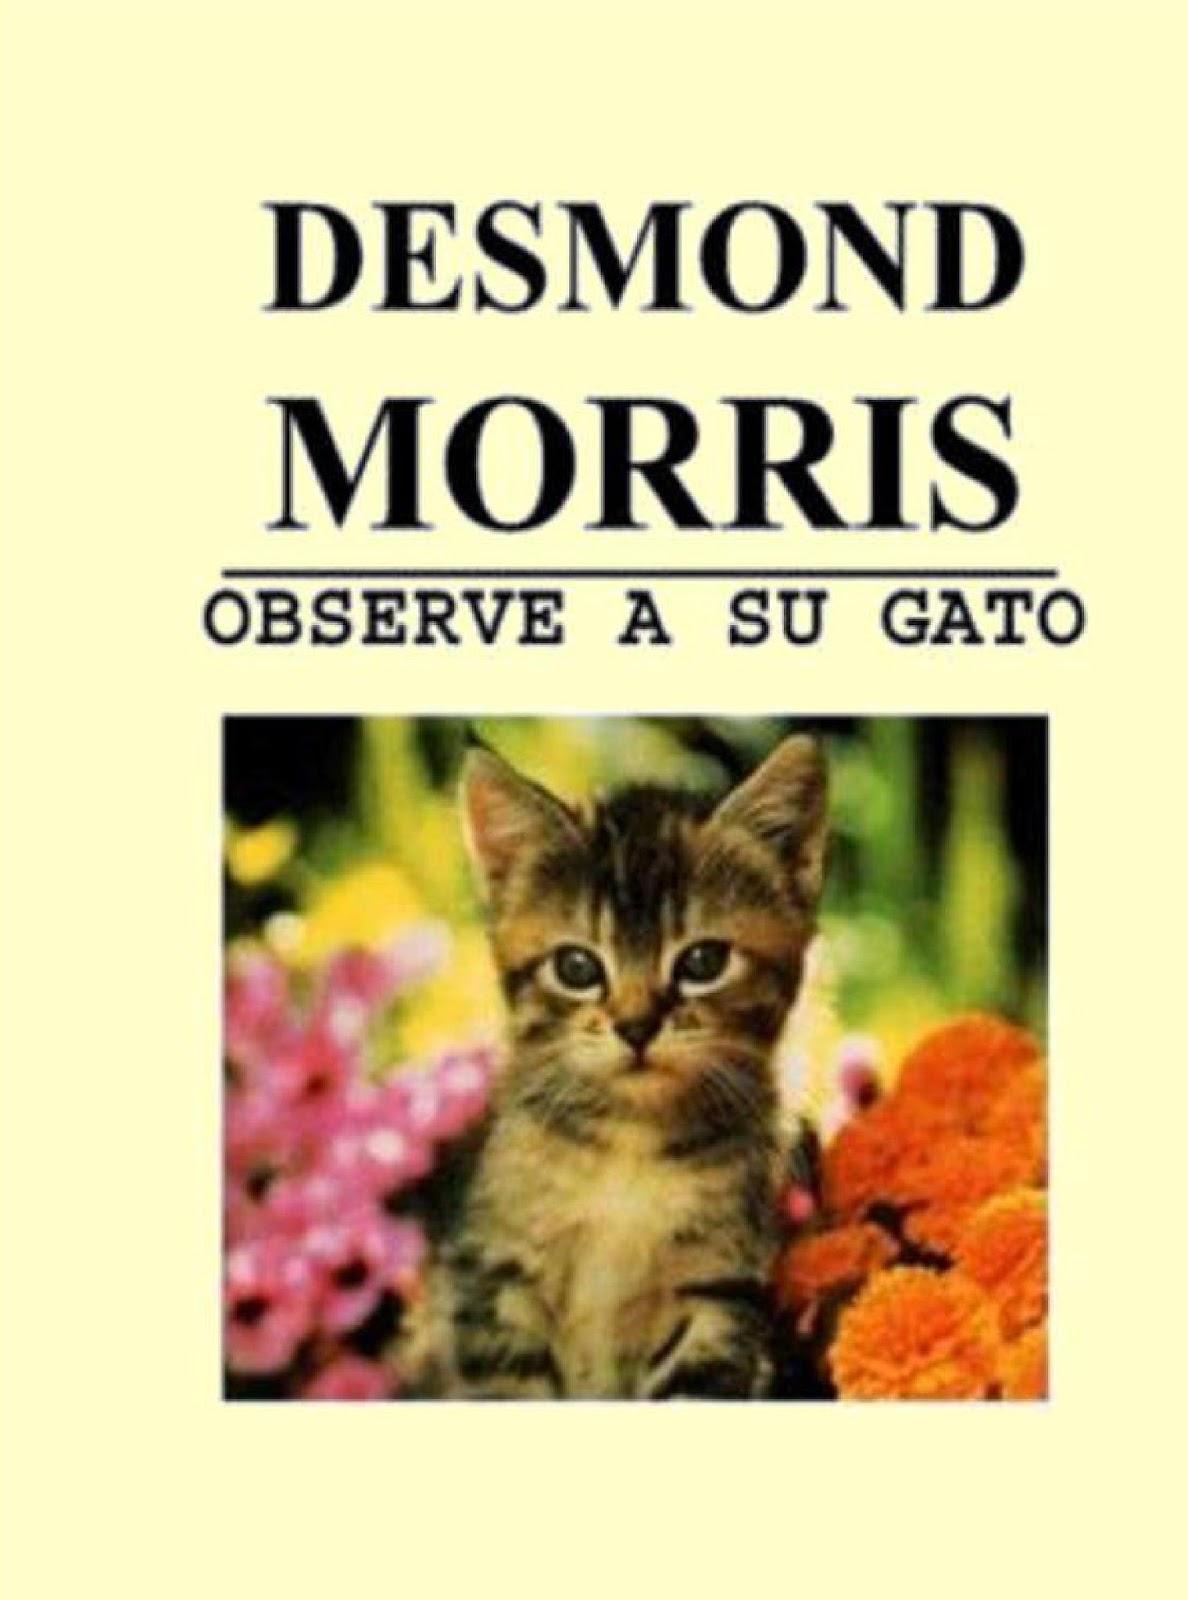 Observe a su gato – Desmond Morris | FreeLibros.Me